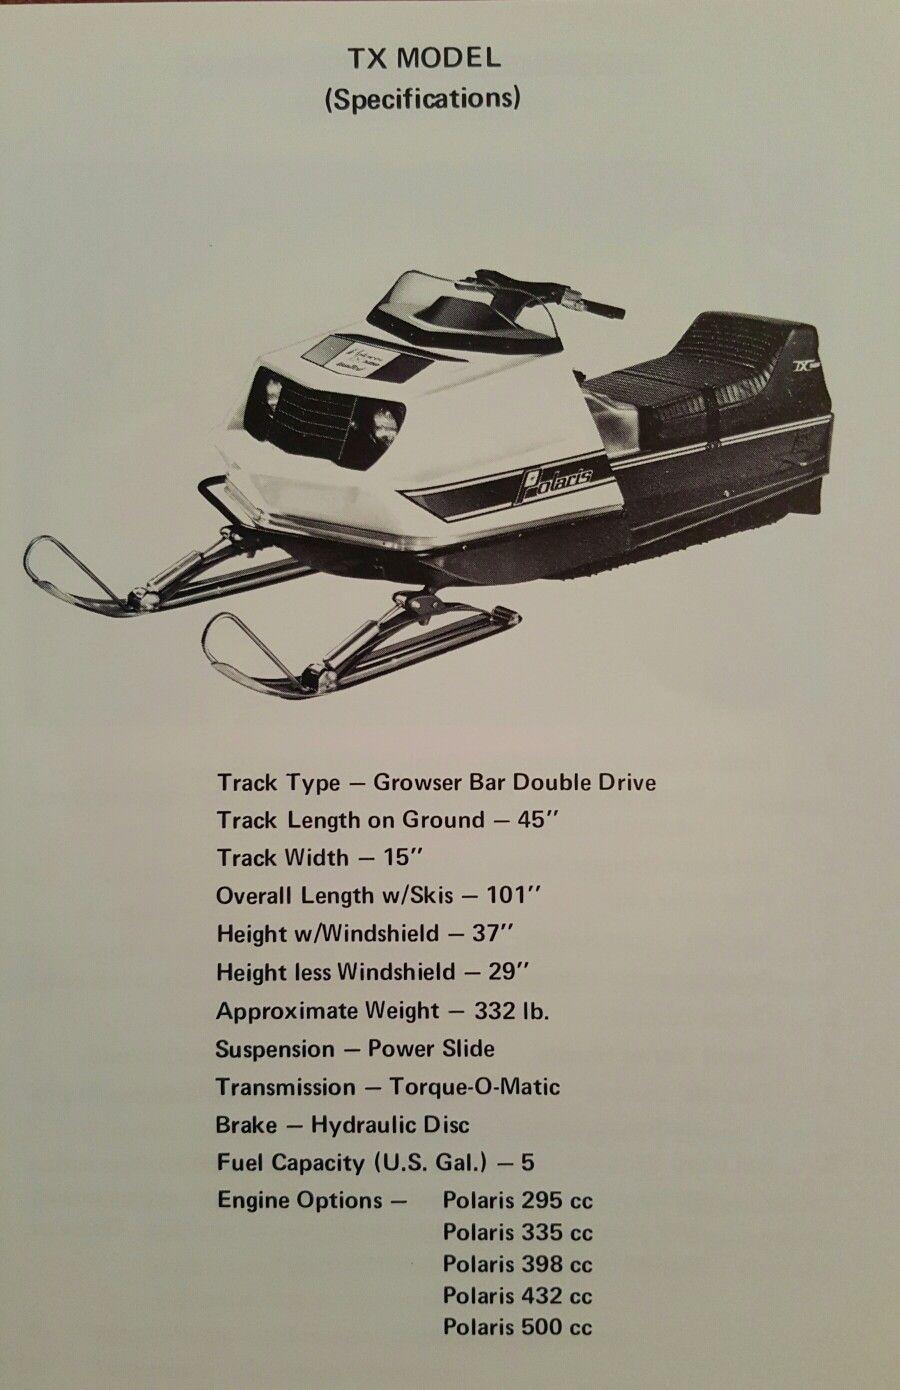 1973 Polaris Tx Snowmobile